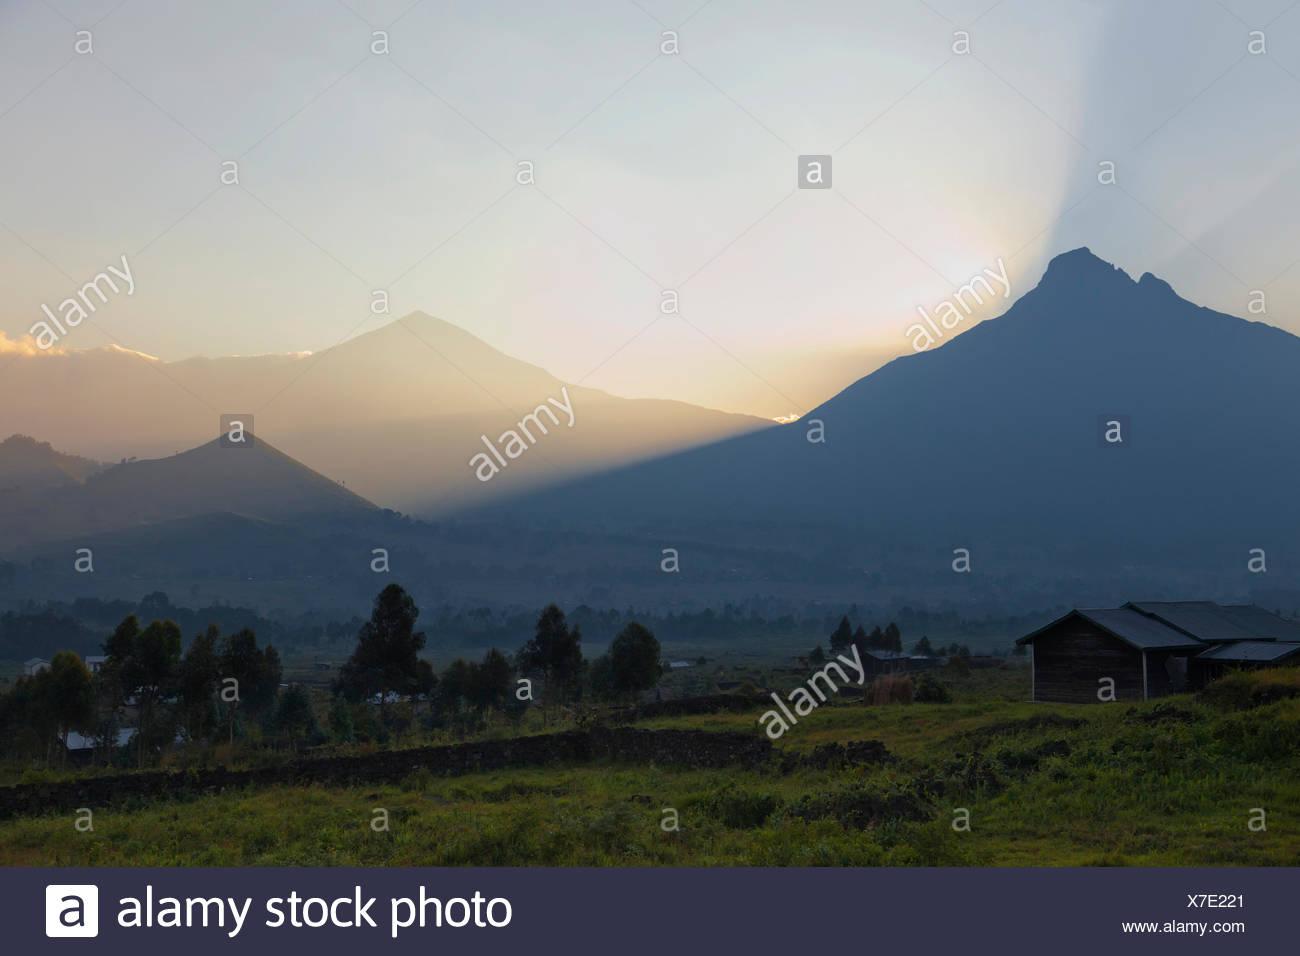 The Virunga volcanoes Mount Mikeno and Mount Karisimbi at sunrise - Stock Image